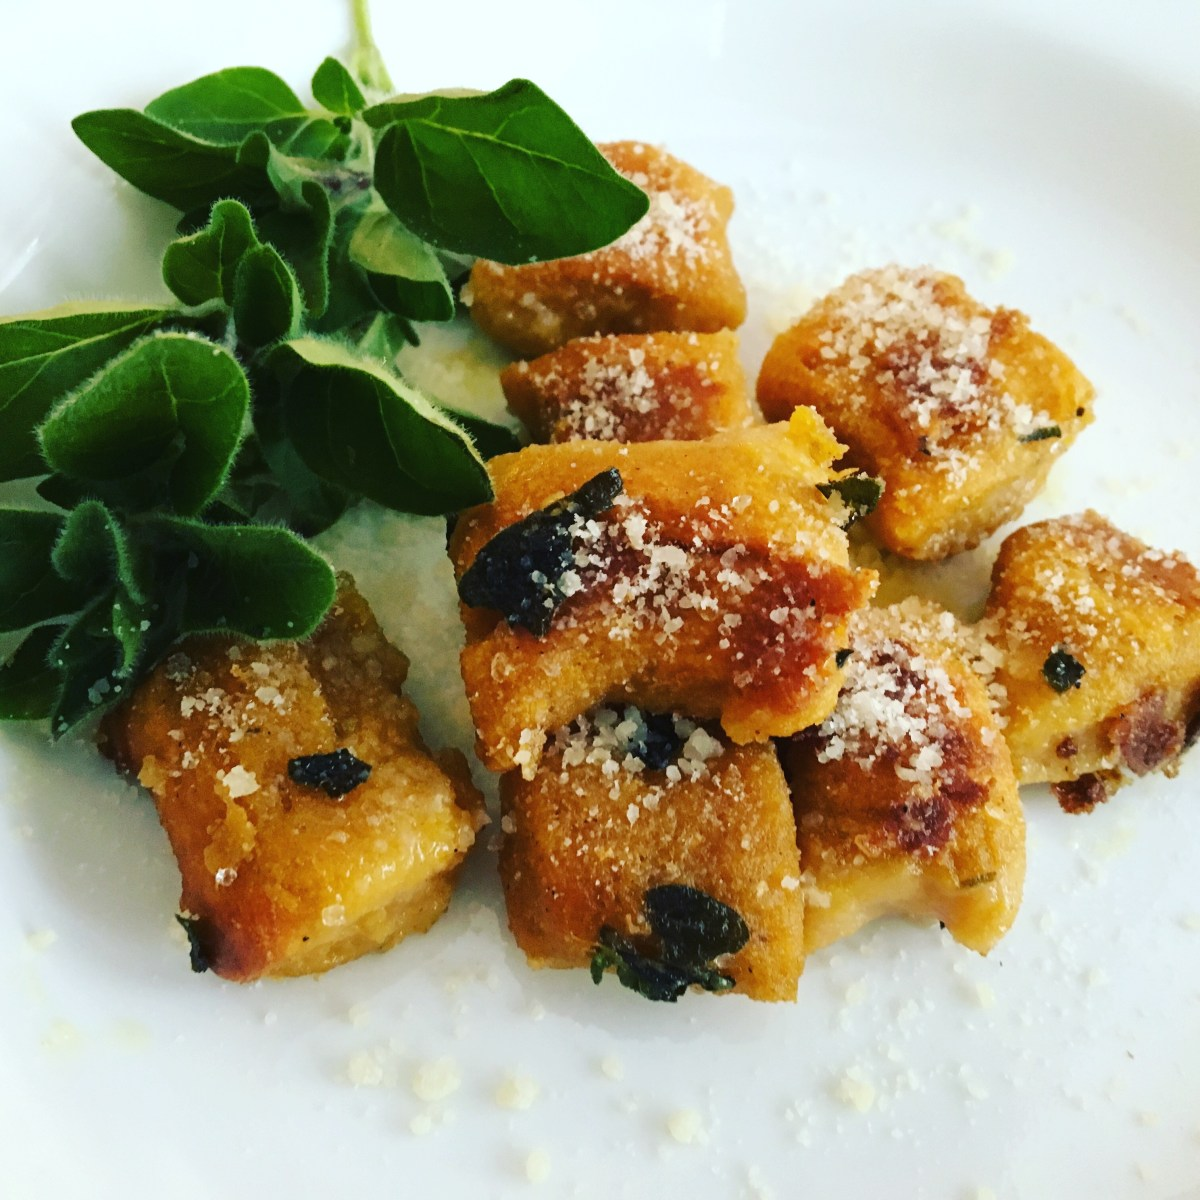 Comfort After Chaos: Sweet Potato Gnocchi with Oregano Olio